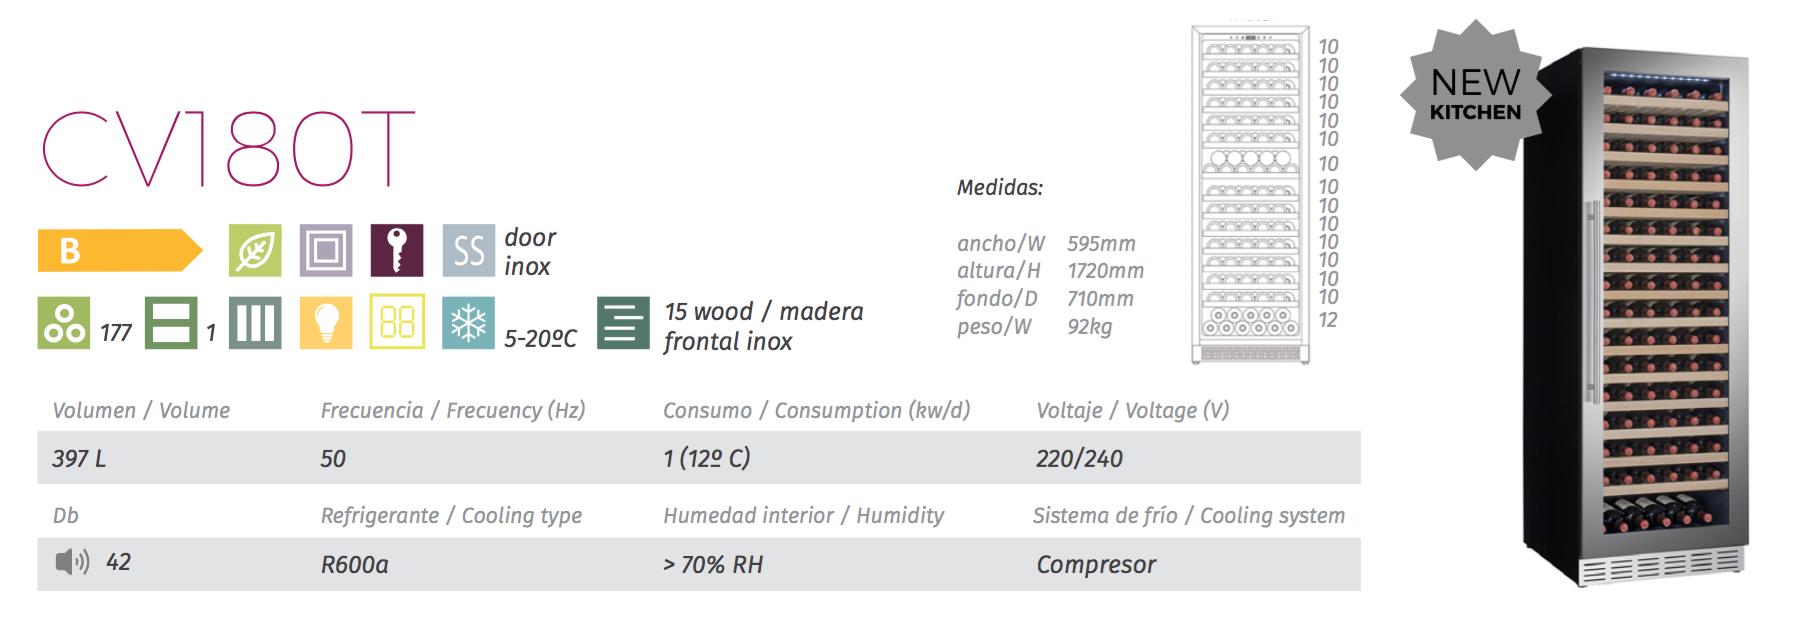 vinoteca cavanova CV180T tabla caracteristicas